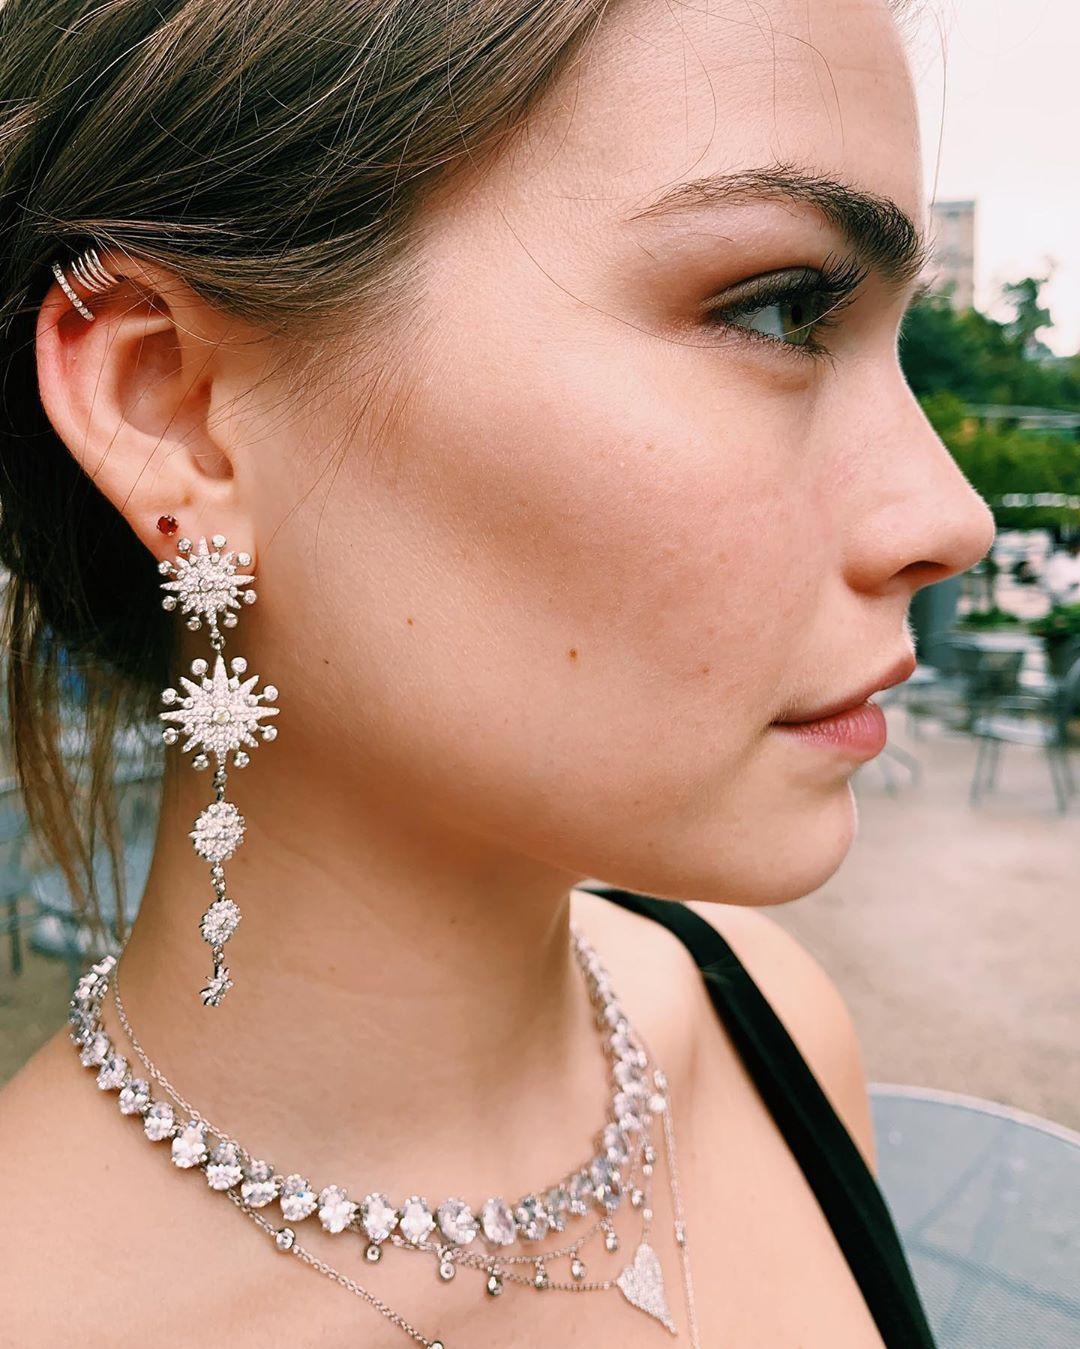 The Gala Earrings in 2020 (With images) Earrings, Ear